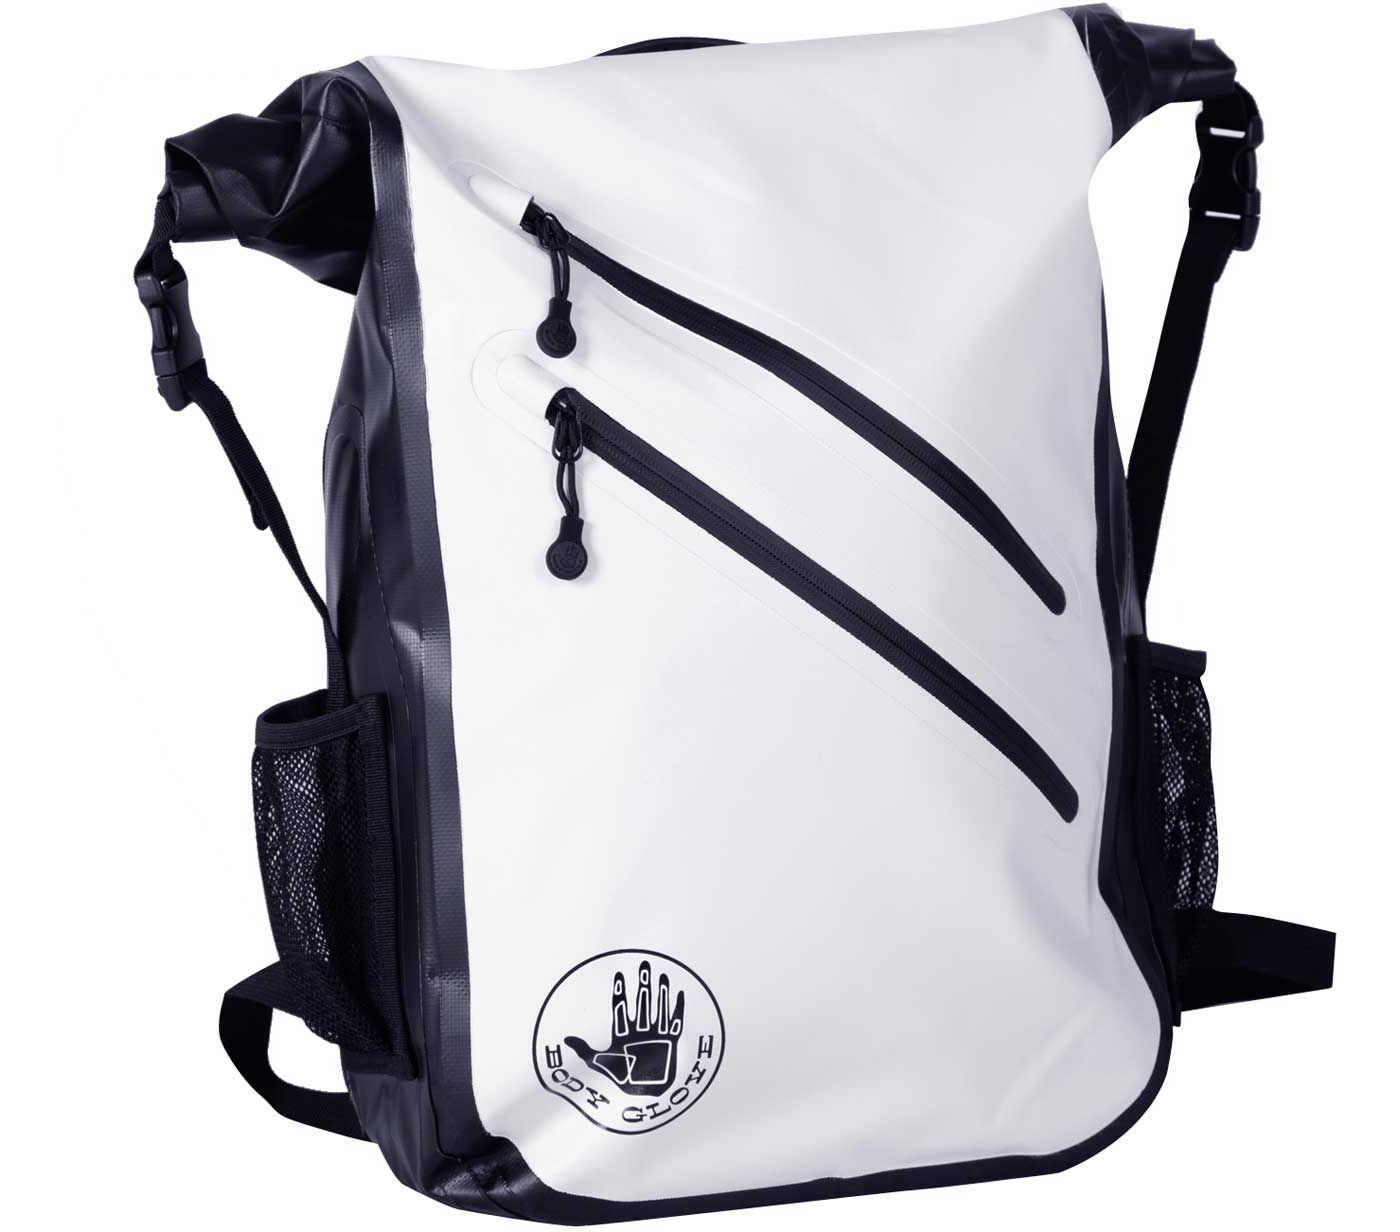 Body Glove Ruxton Waterproof Backpack